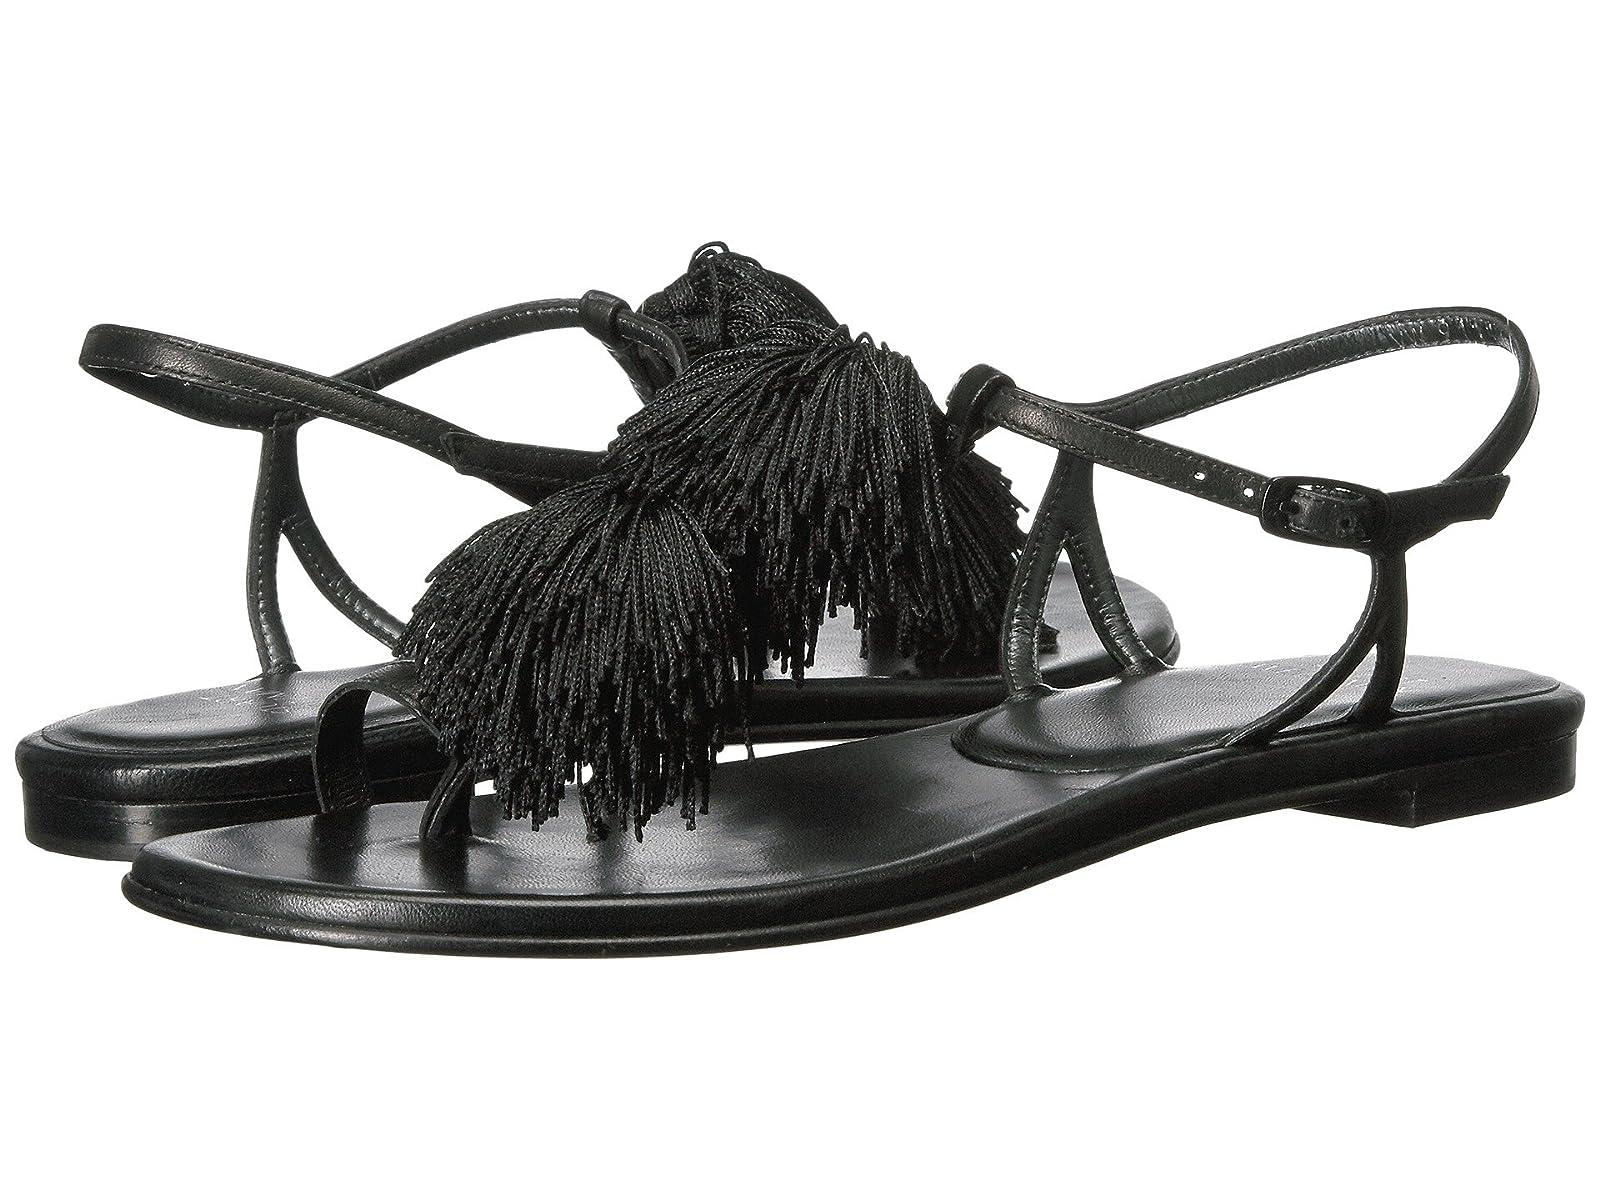 Stuart Weitzman JabowCheap and distinctive eye-catching shoes